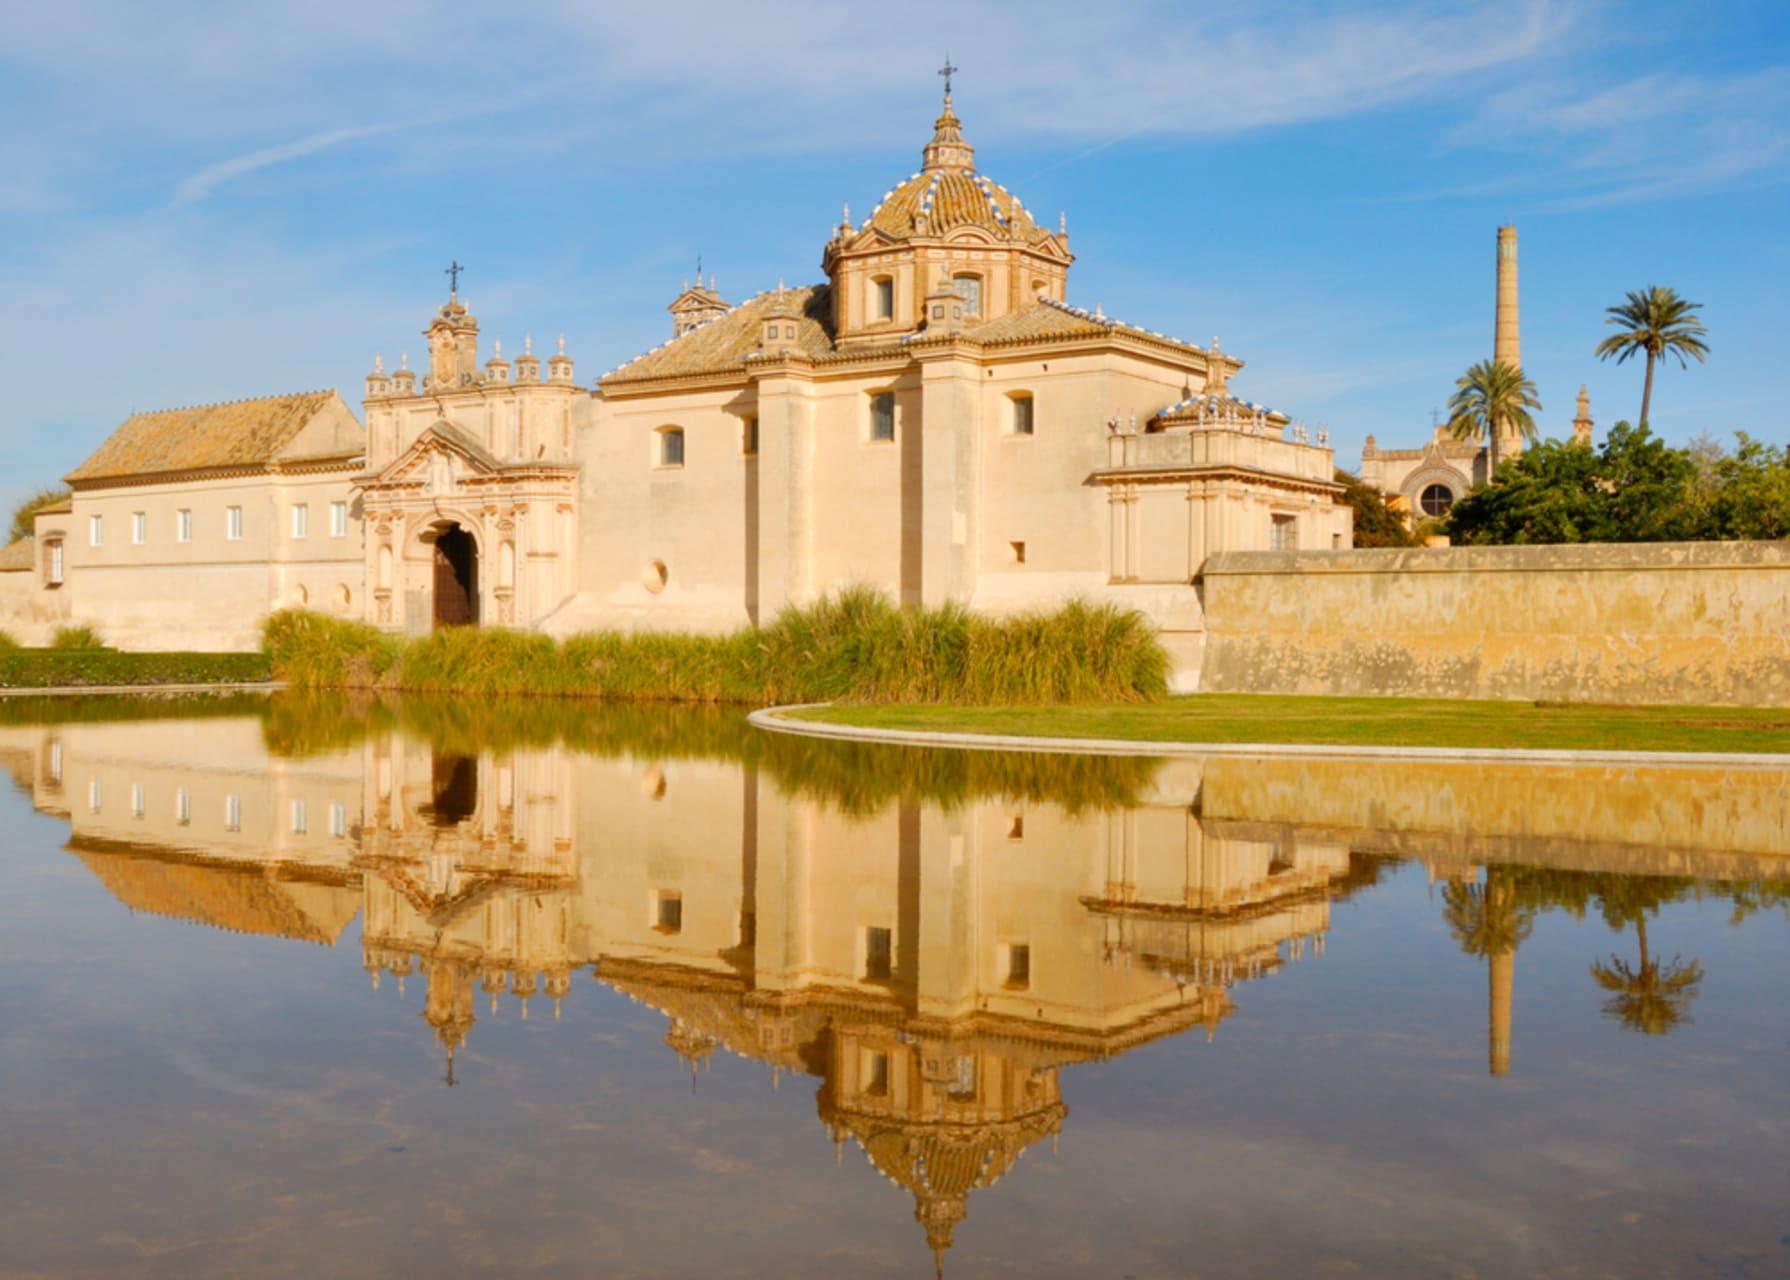 Seville - La Cartuja: The Story of Ferdinand Columbus